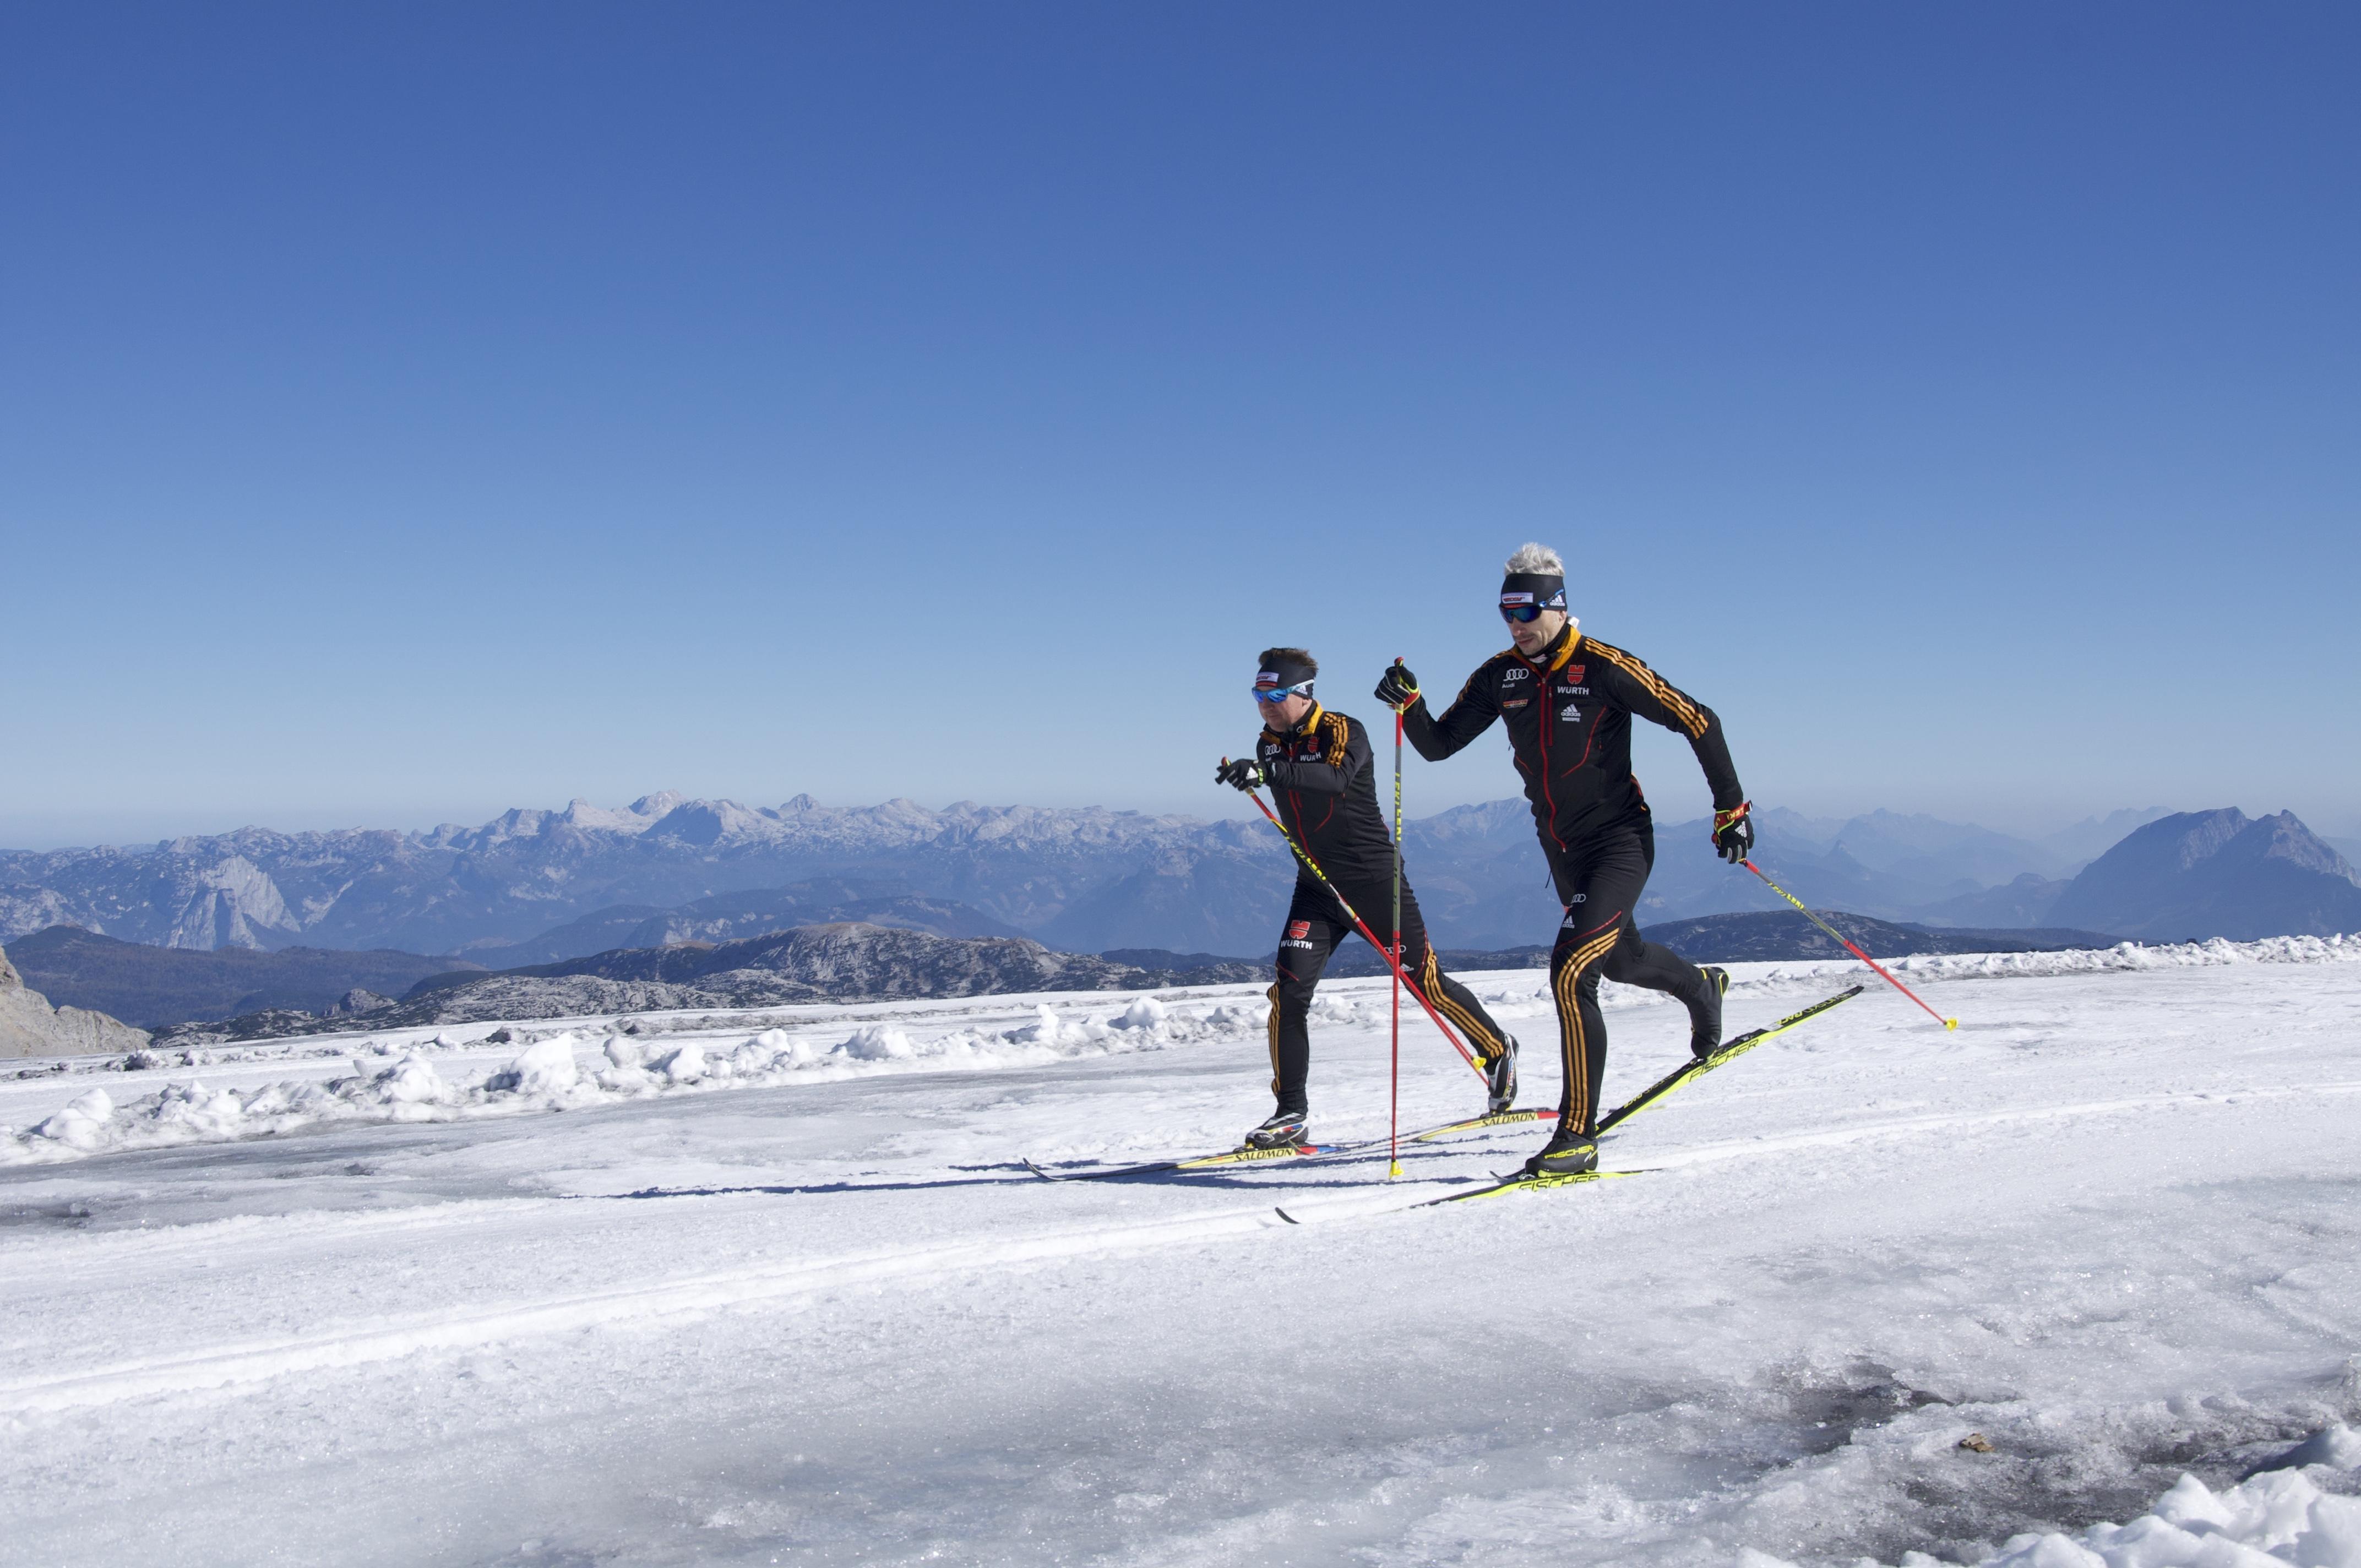 Skilanglauf Nordisch aktiv Carsten Bartel Thomas Staacks